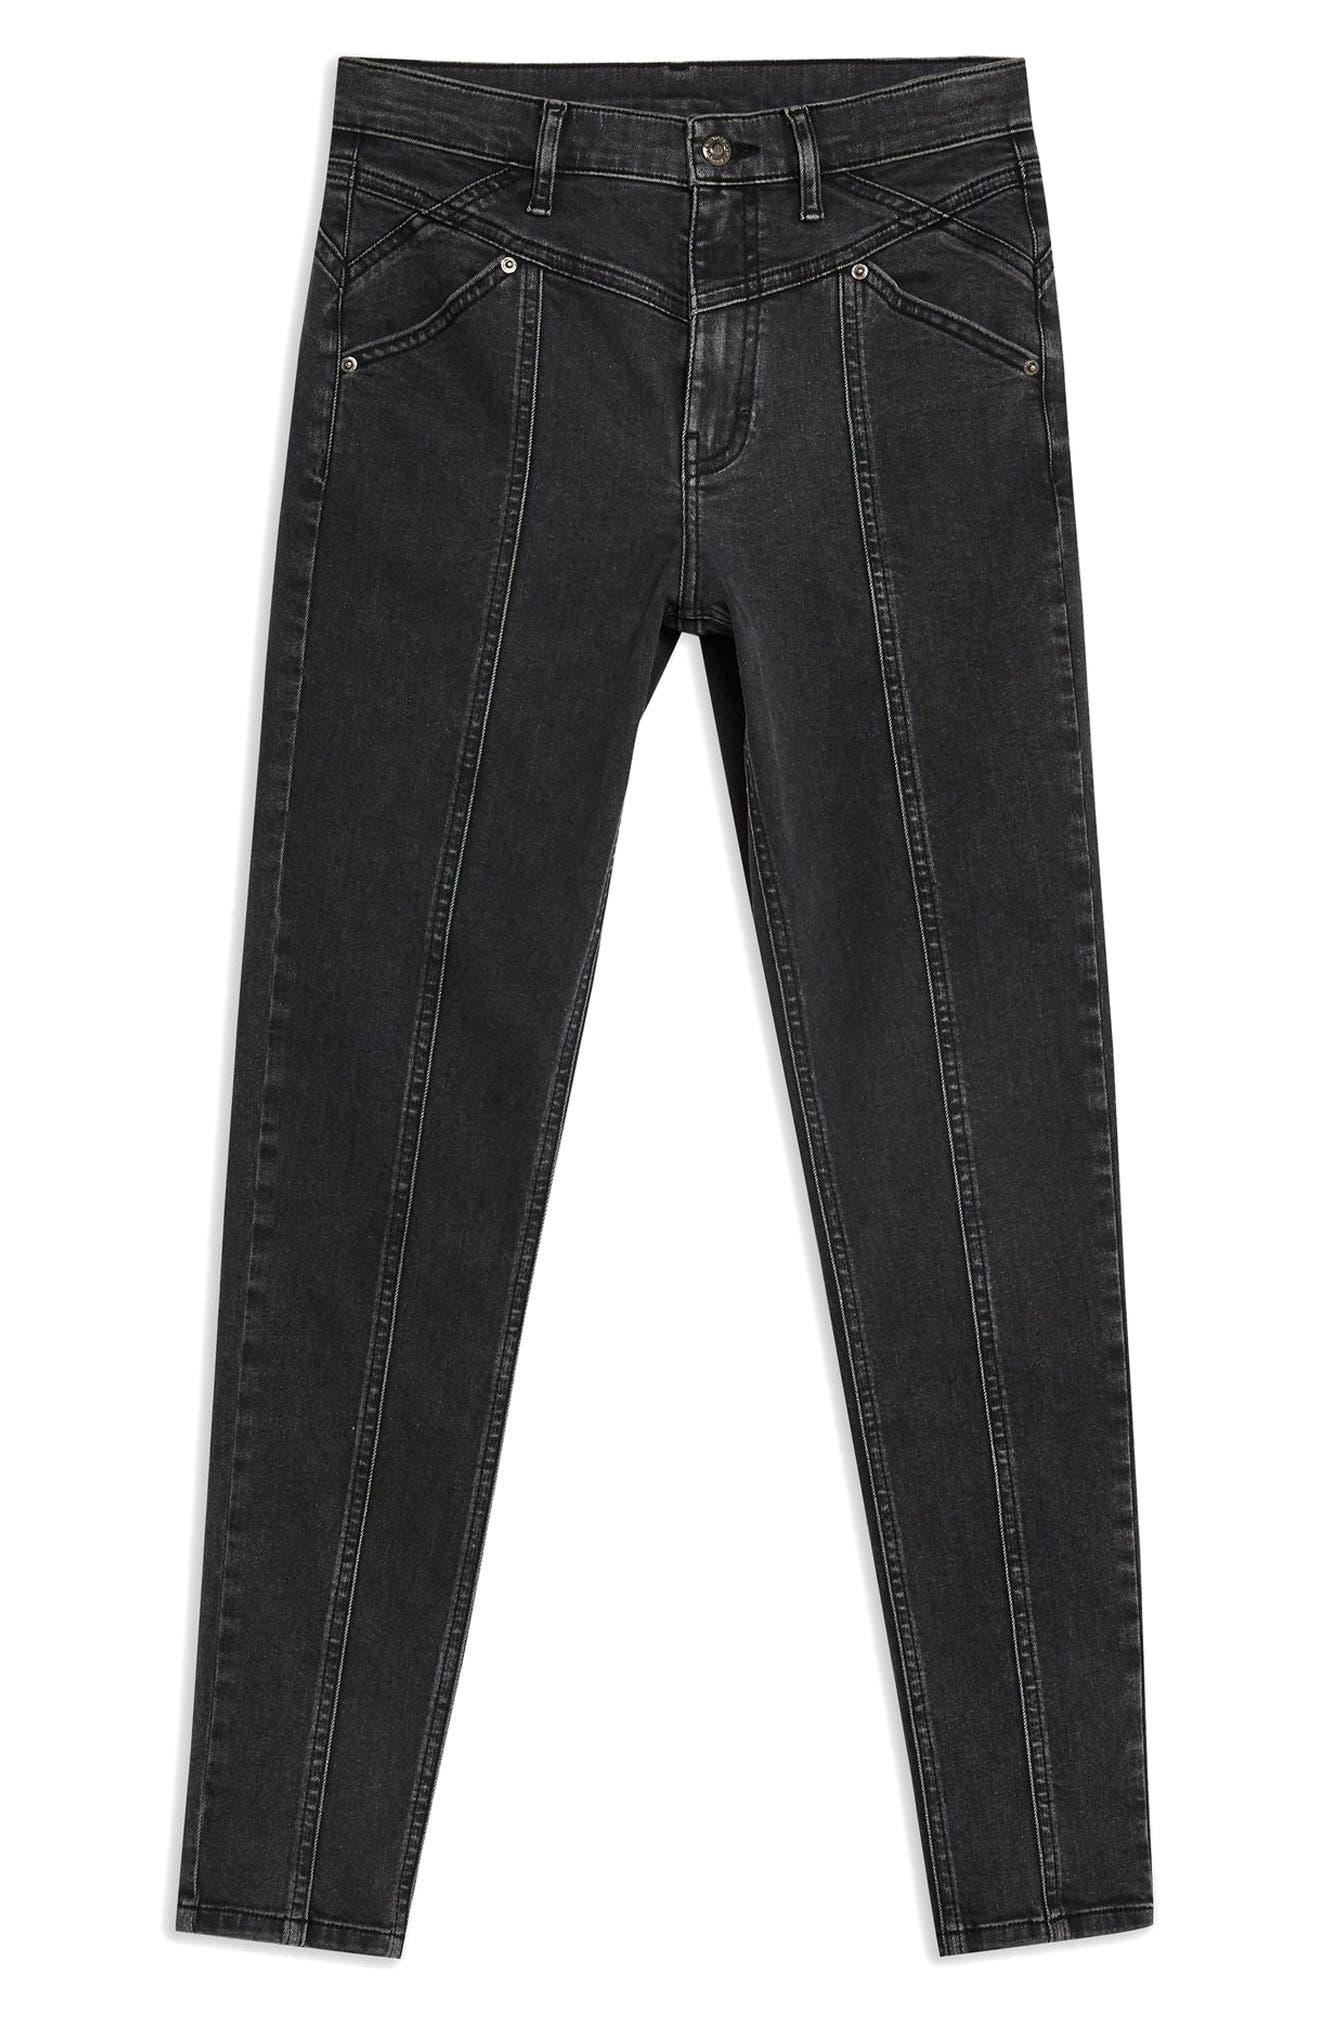 TOPSHOP, Jamie Panel High Waist Skinny Jeans, Alternate thumbnail 5, color, WASHED BLACK